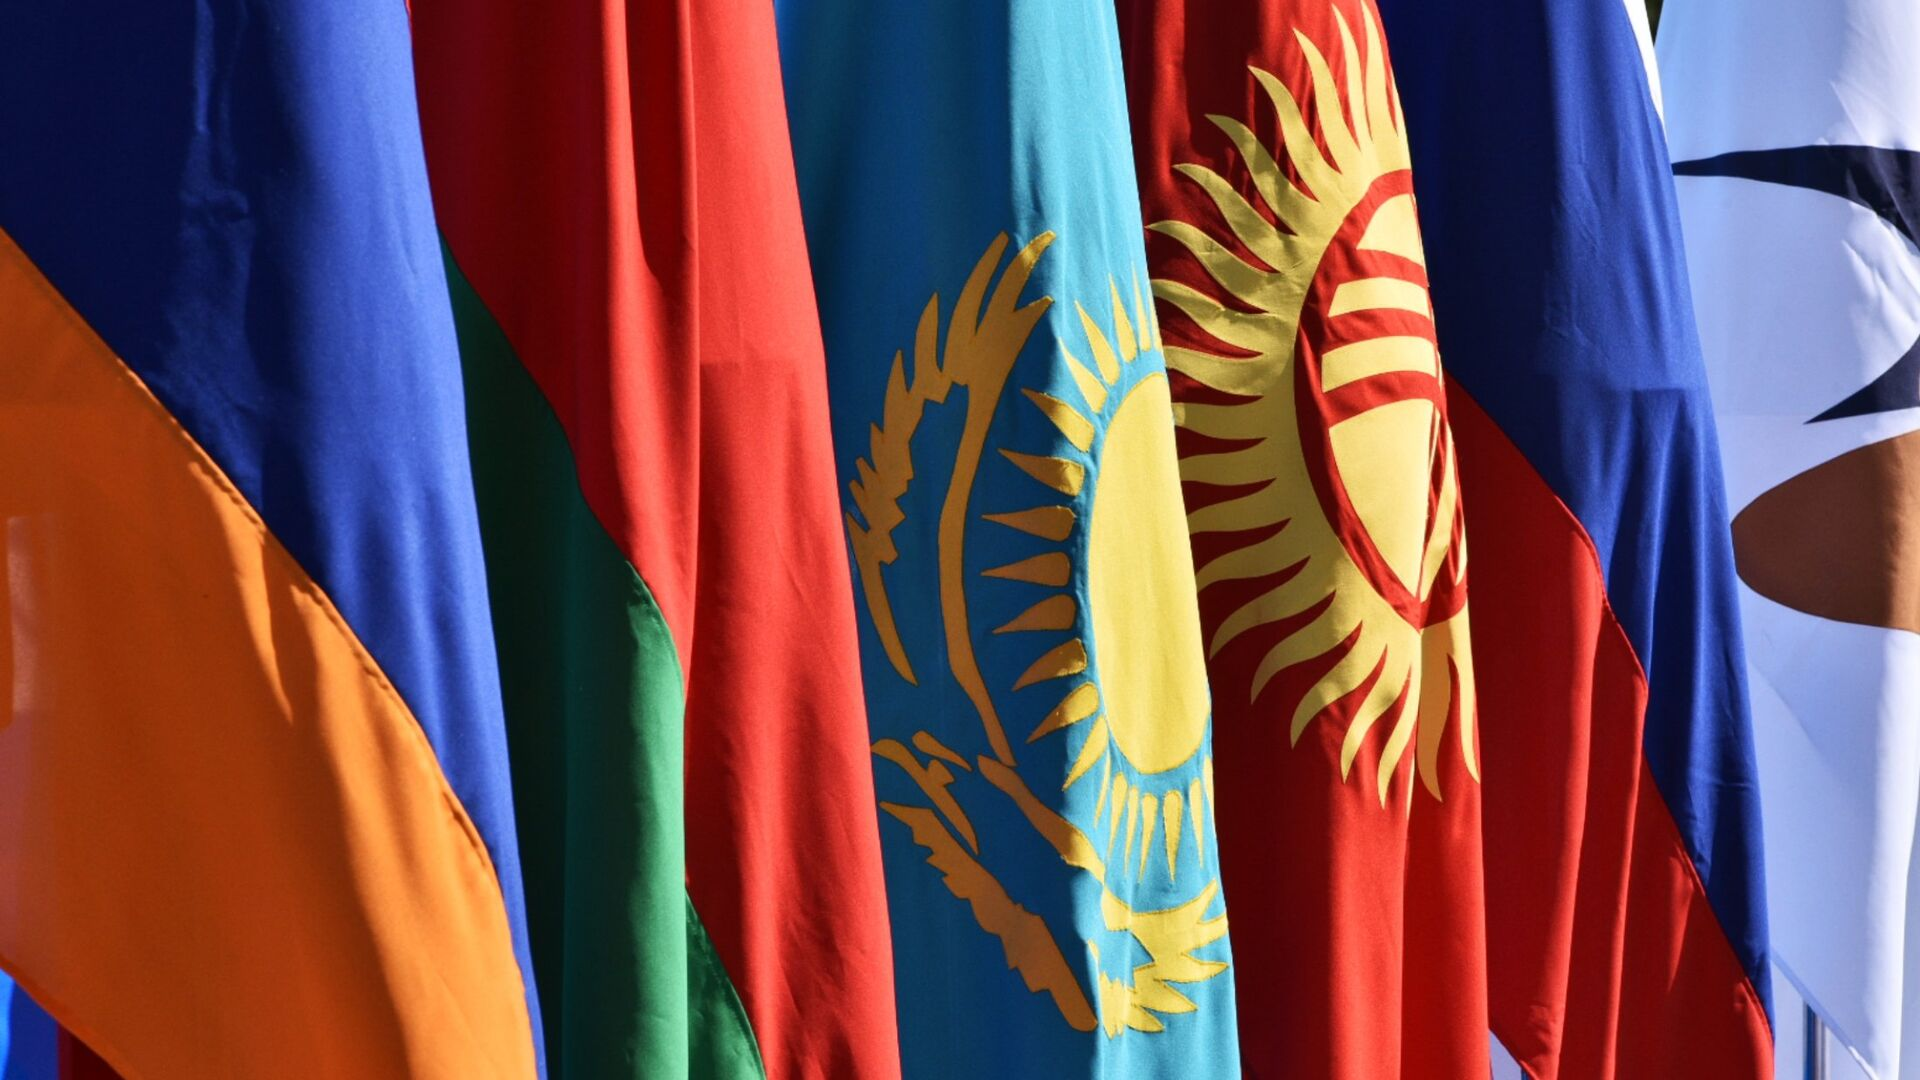 Государственные флаги стран ЕАЭС - Sputnik Беларусь, 1920, 16.06.2021